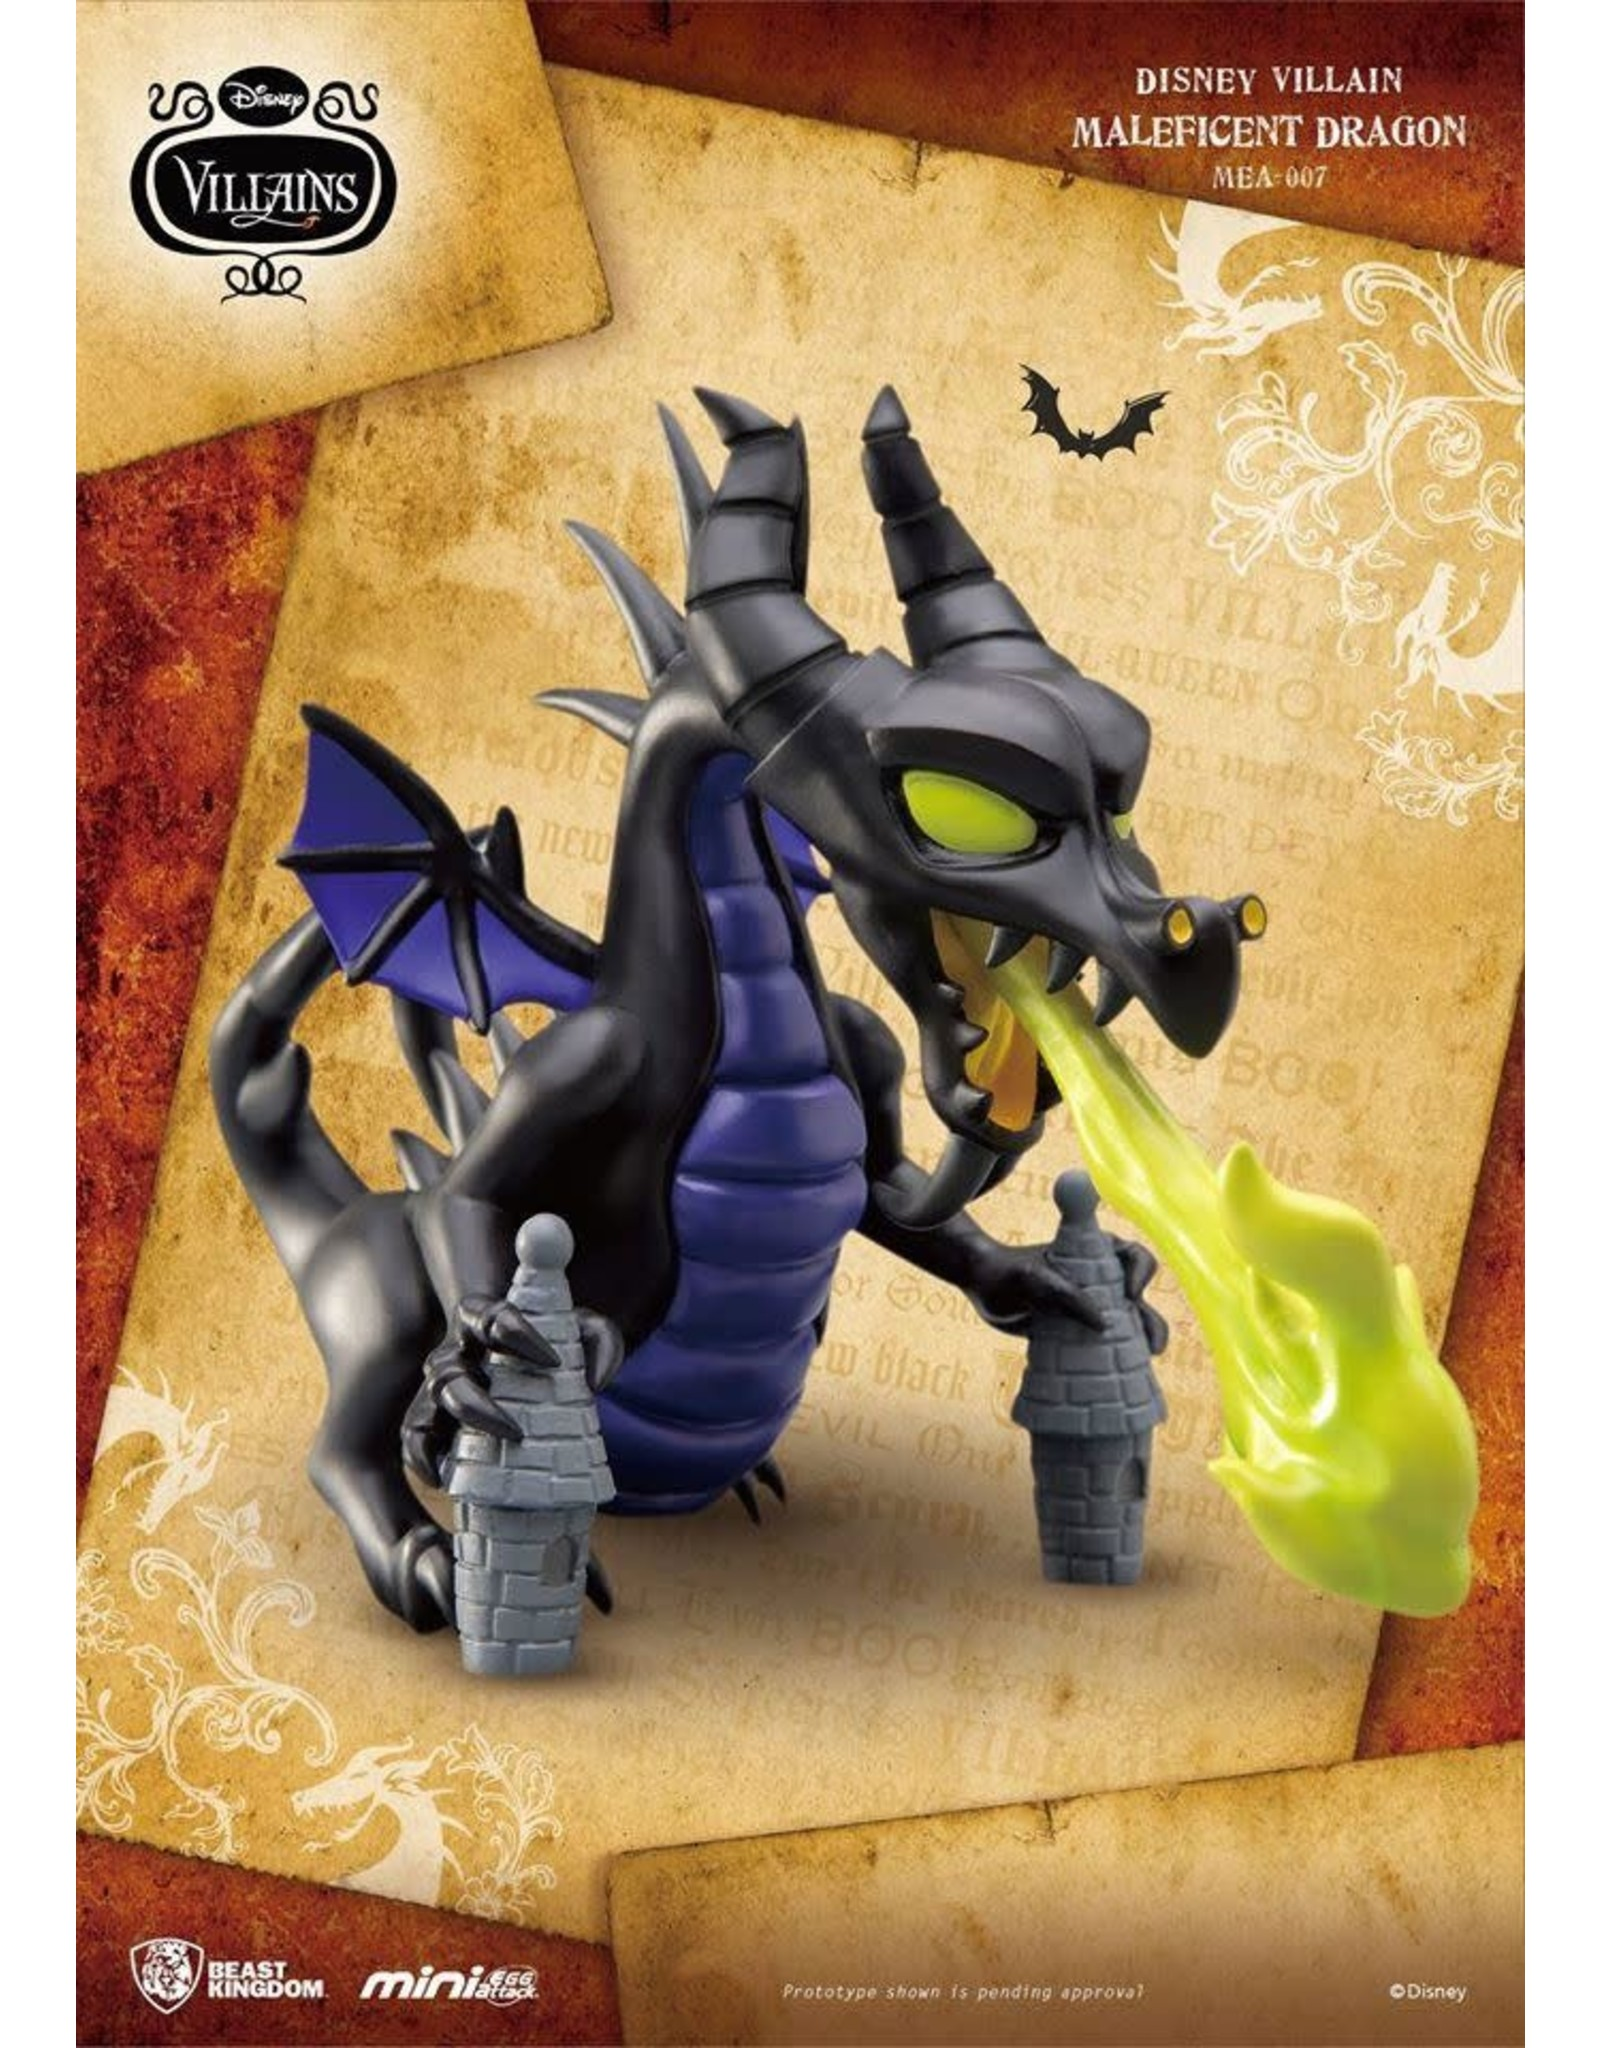 DISNEY VILLAINS - Figurine Mini Egg Attack - Maleficent Dragon - 10cm